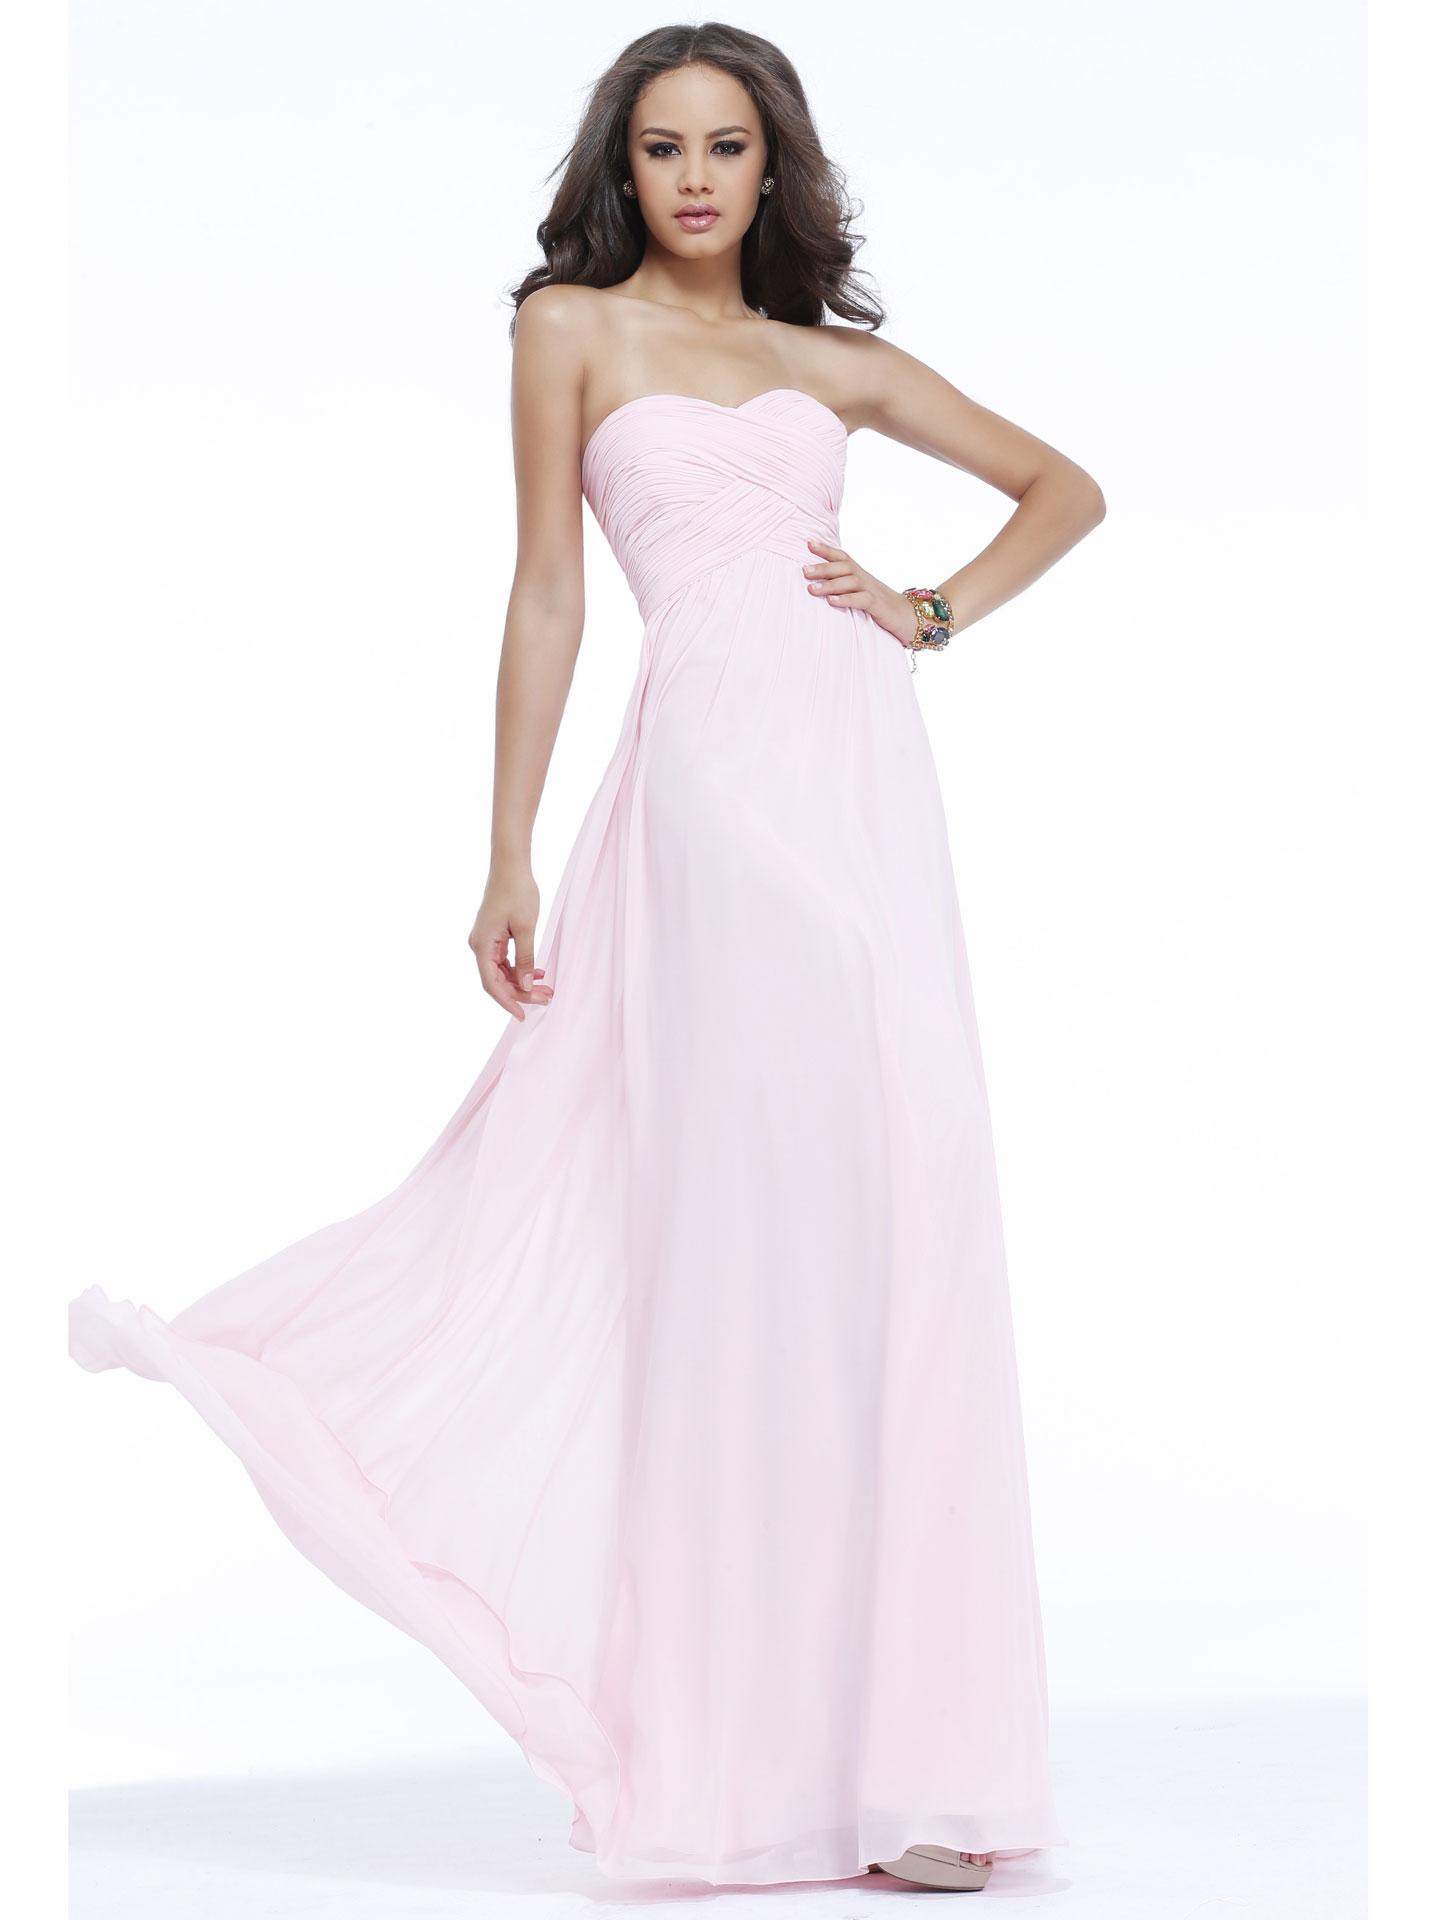 sea foam green prom dress | Gommap Blog